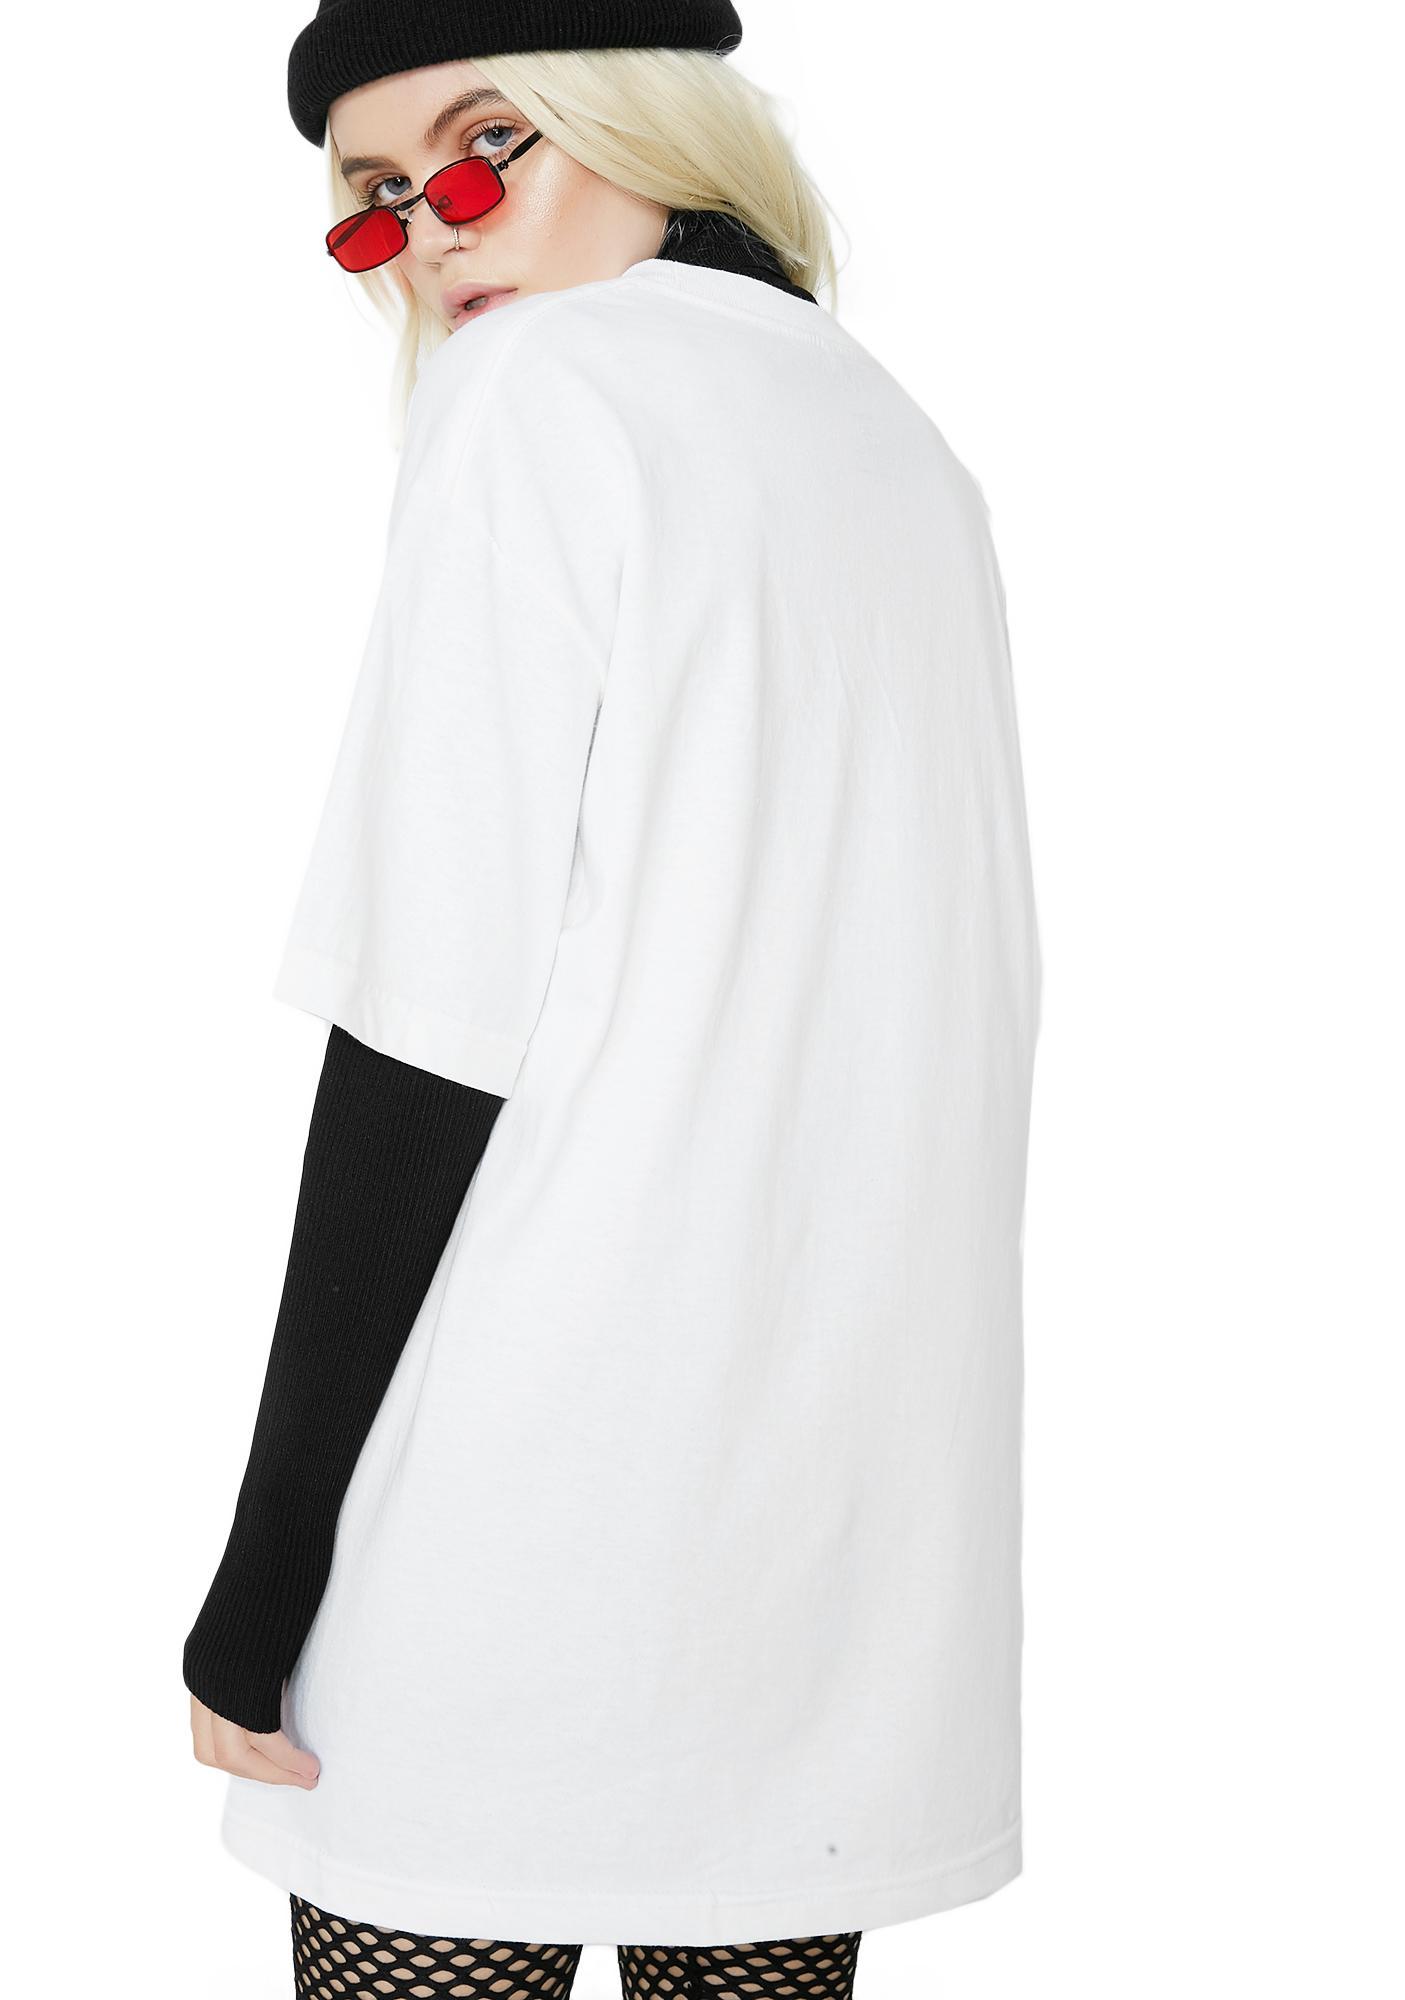 Mishka Adored T-Shirt